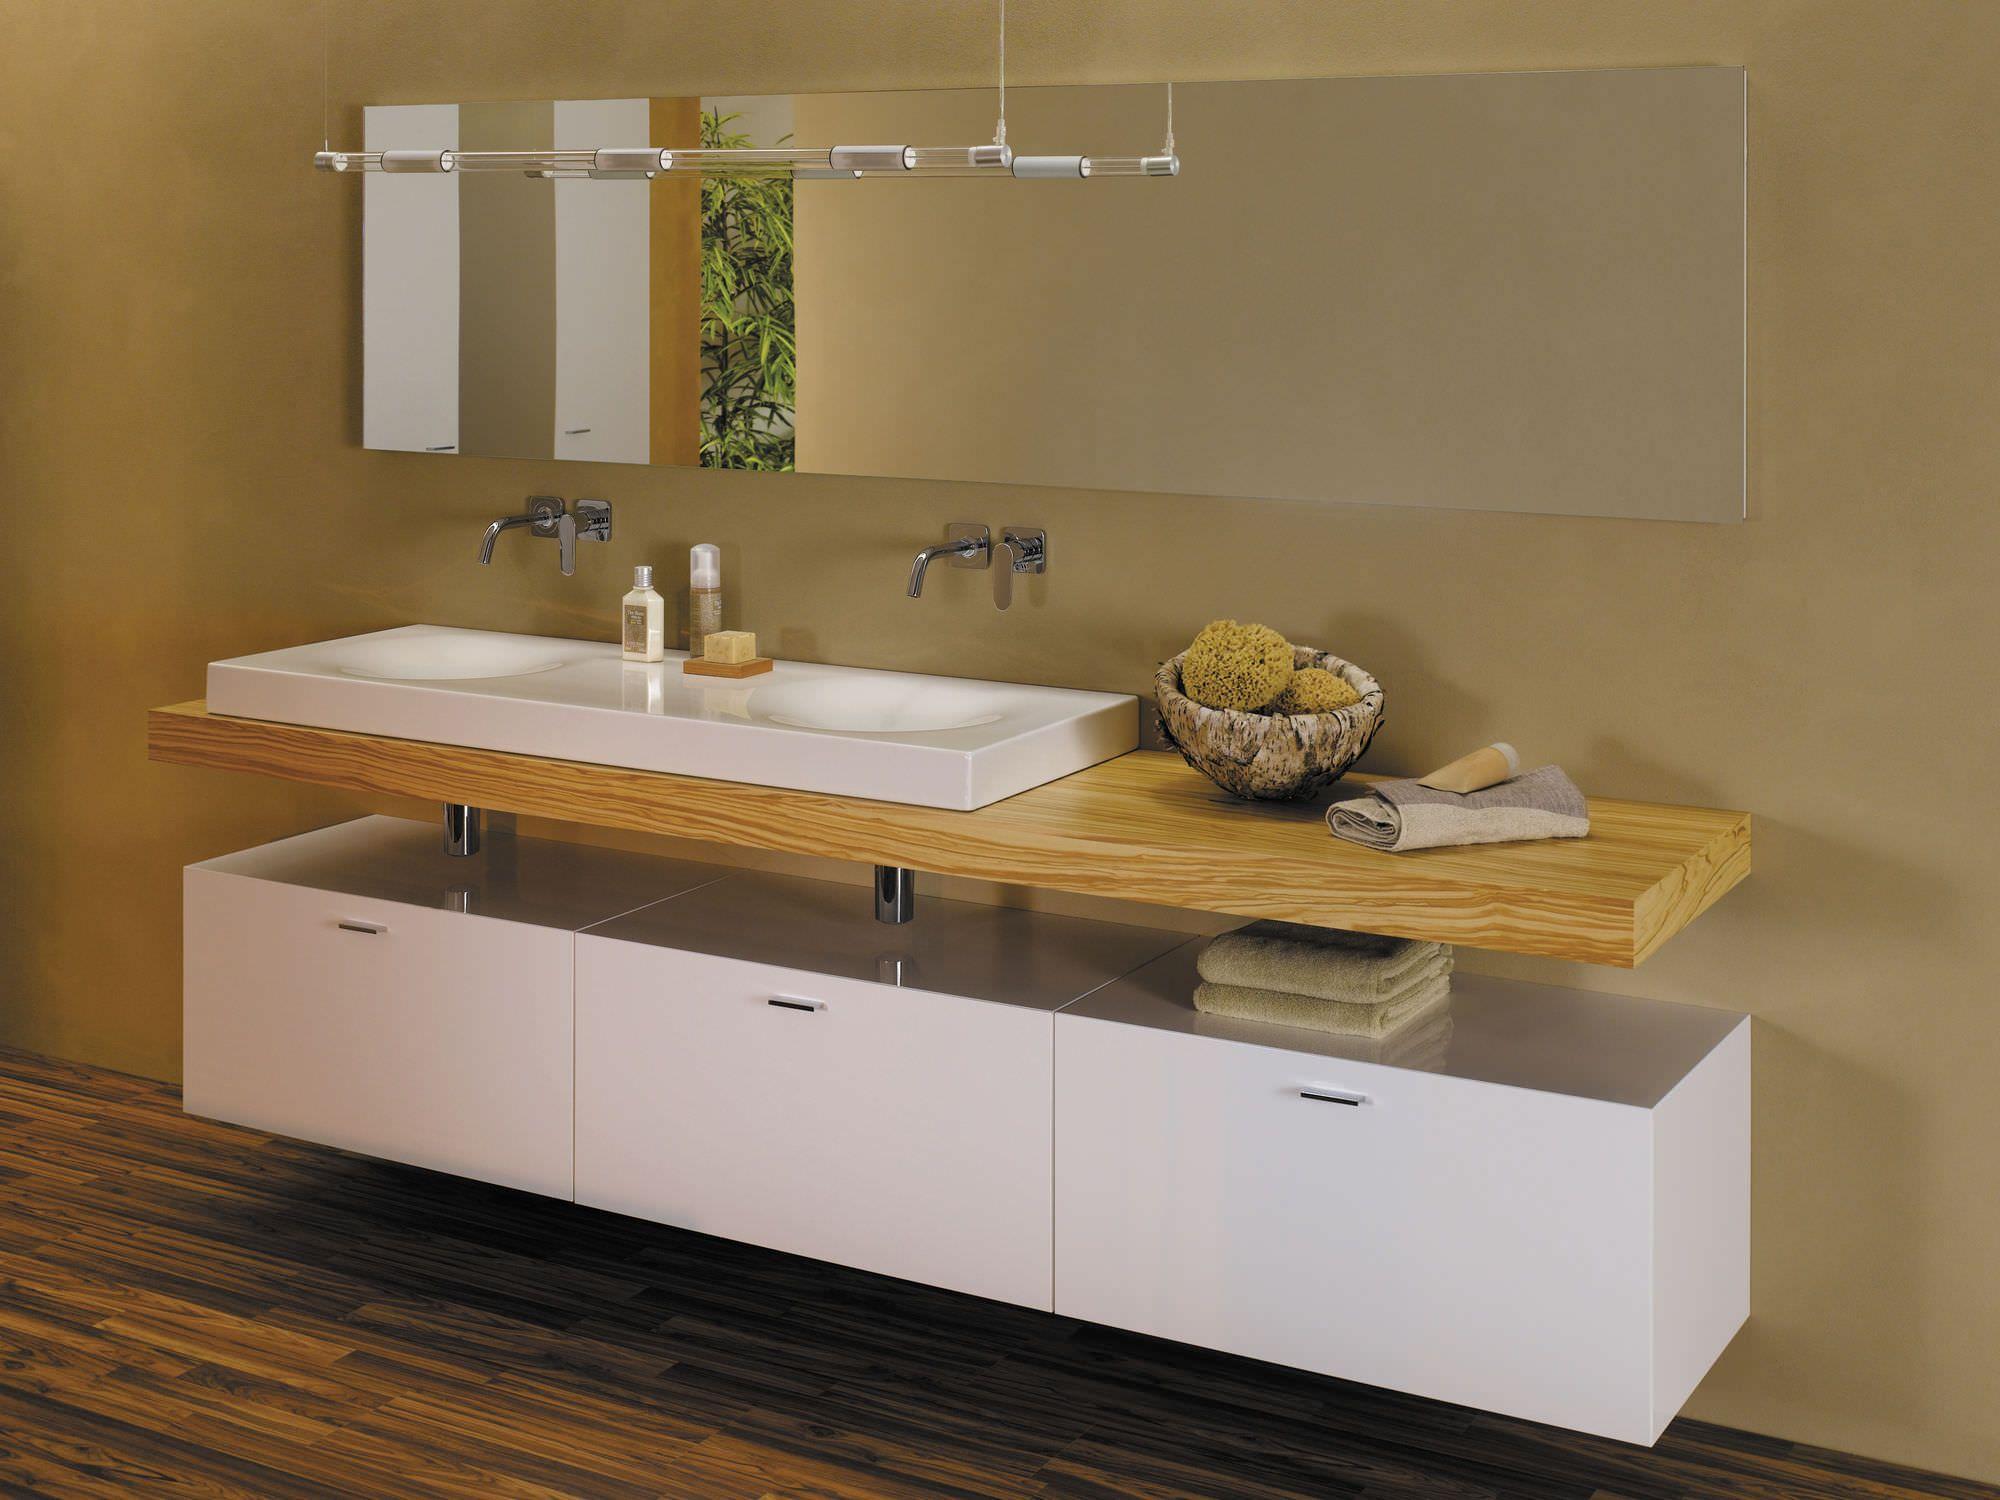 Nett Waschtischunterschrank Fur Aufsatzwaschbecken Unterschrank Fur Aufsatzwaschbecken Aufsatzwaschbecken Badezimmer Unterschrank